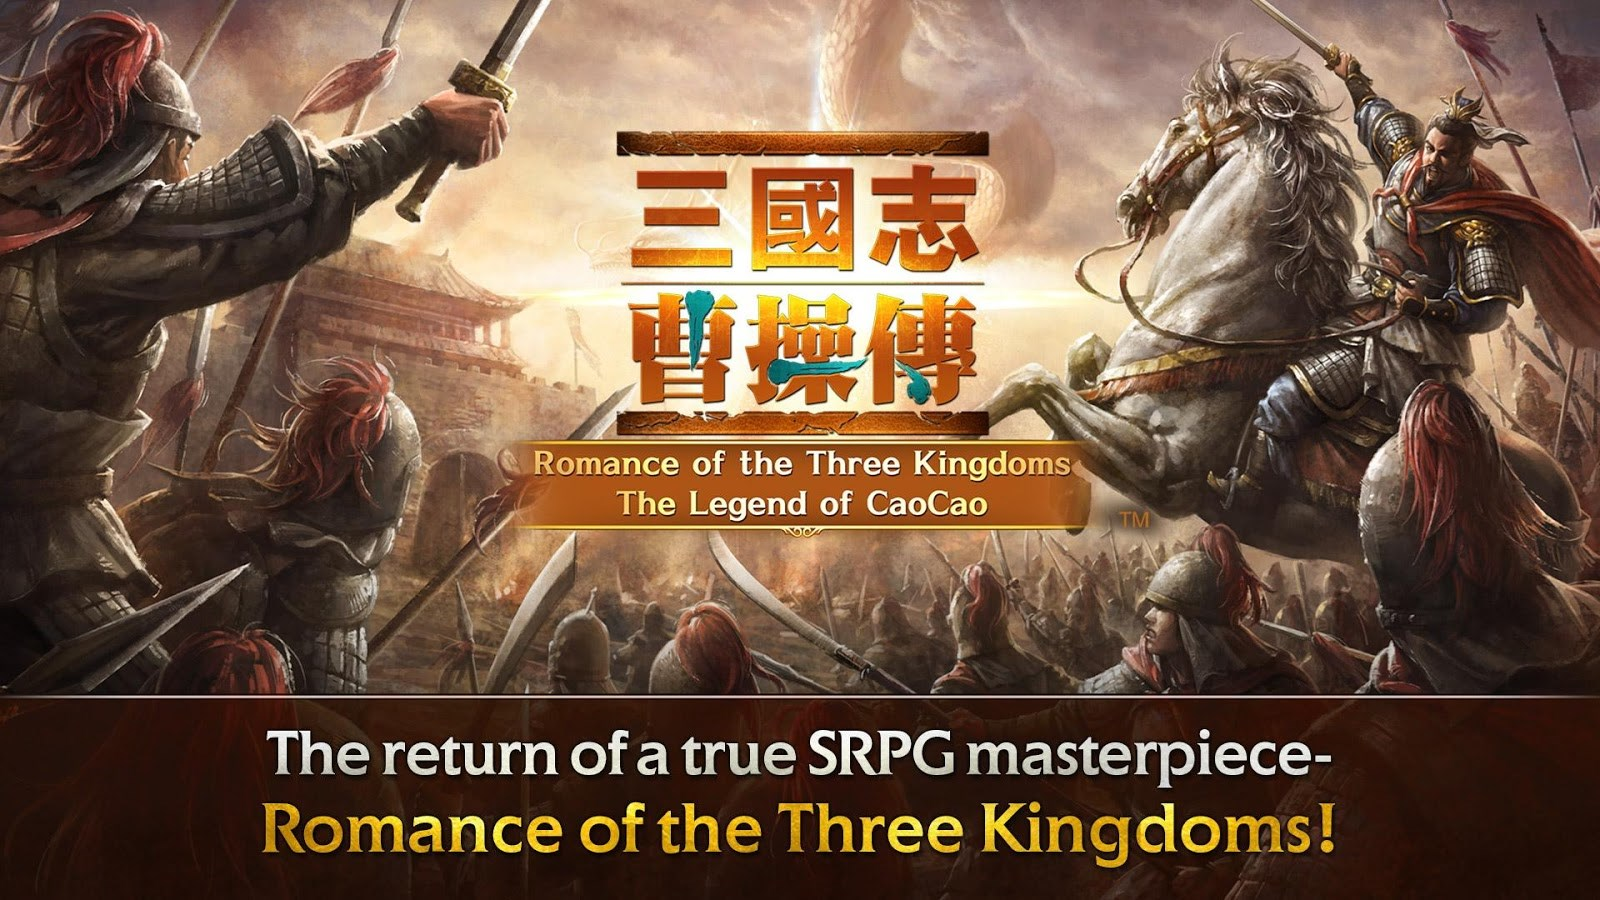 Romance of the Three Kingdoms - Imagem 1 do software